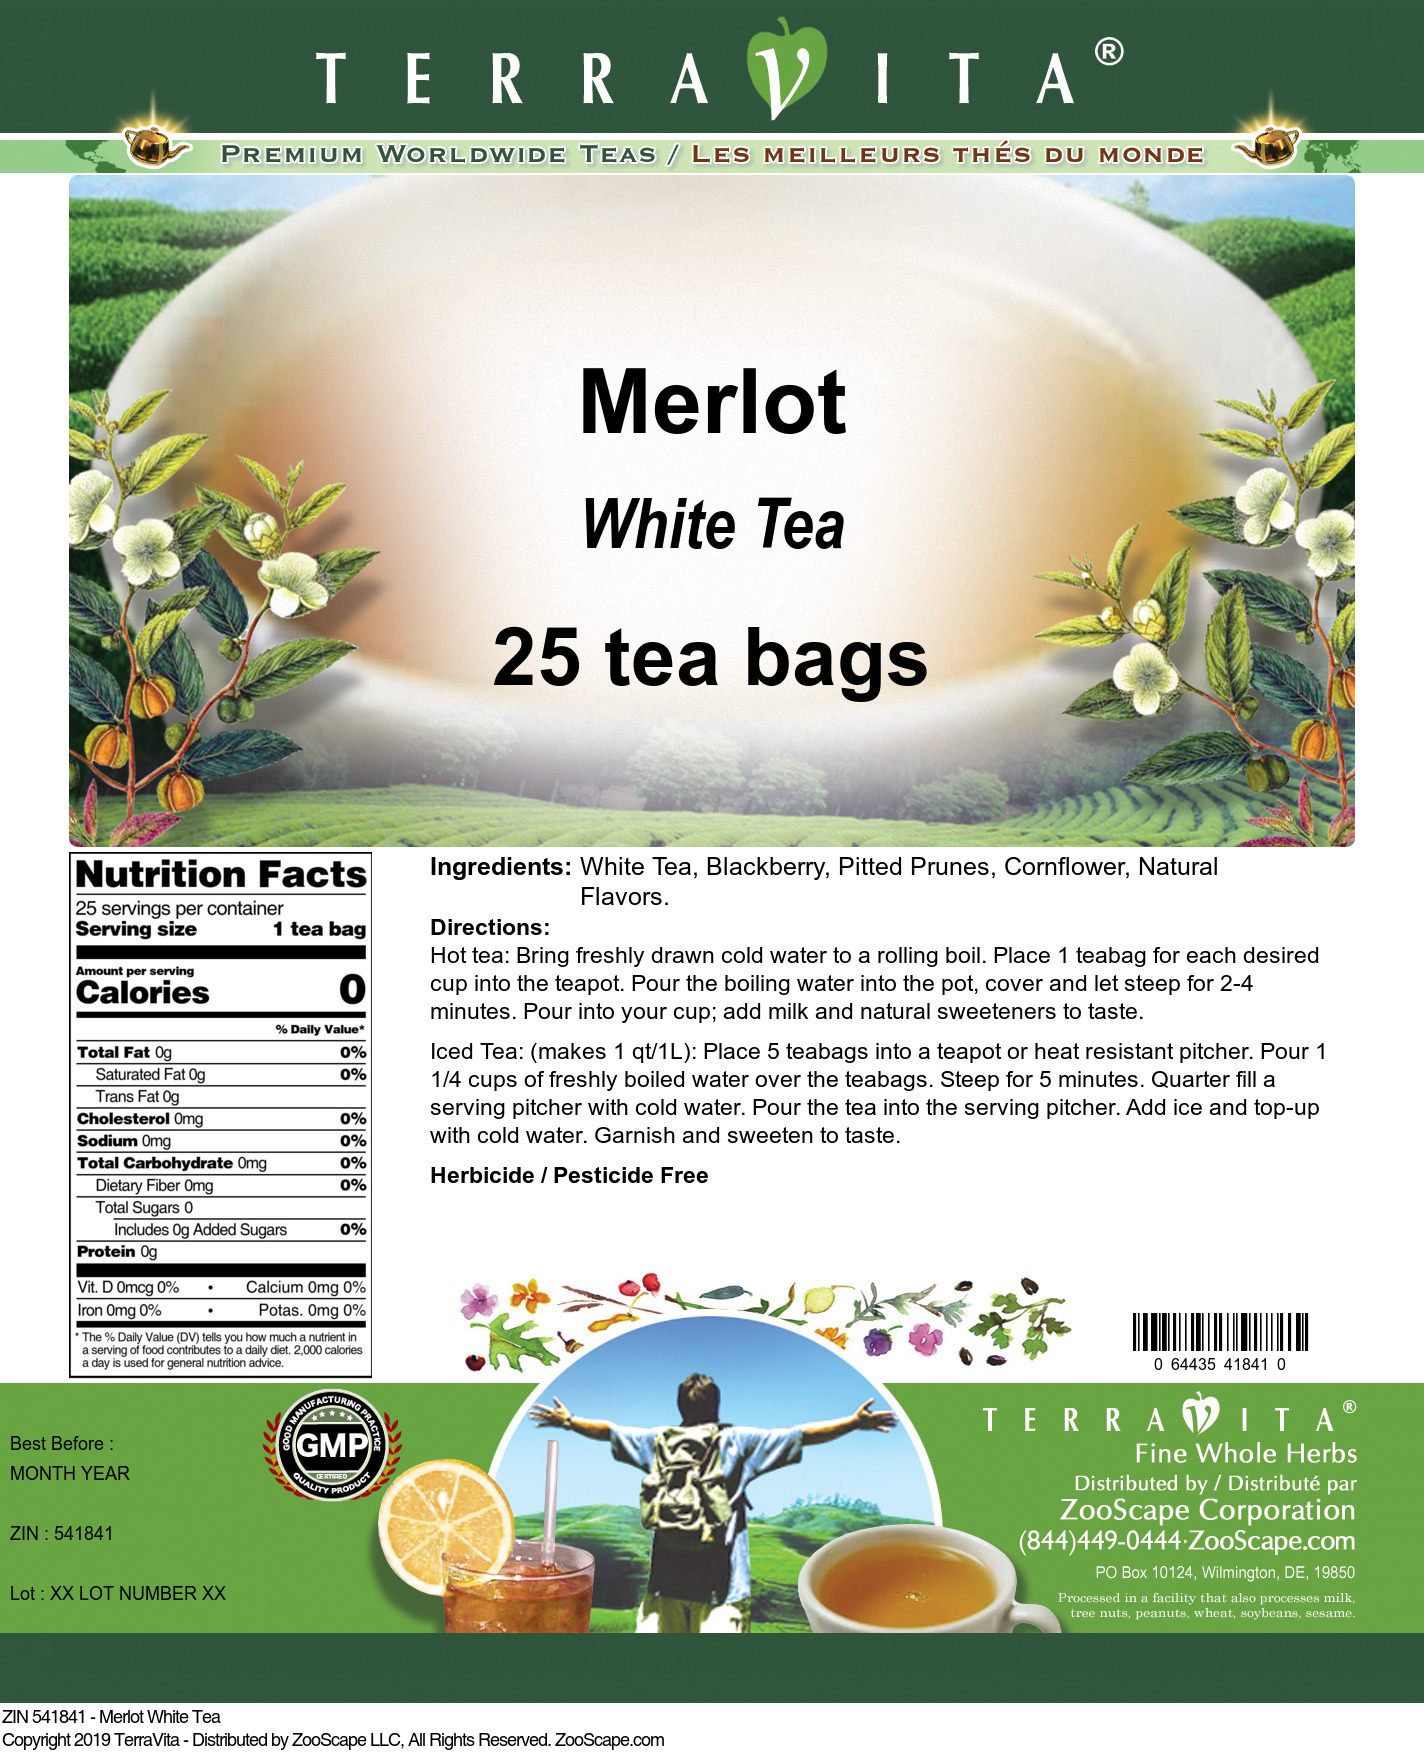 Merlot White Tea